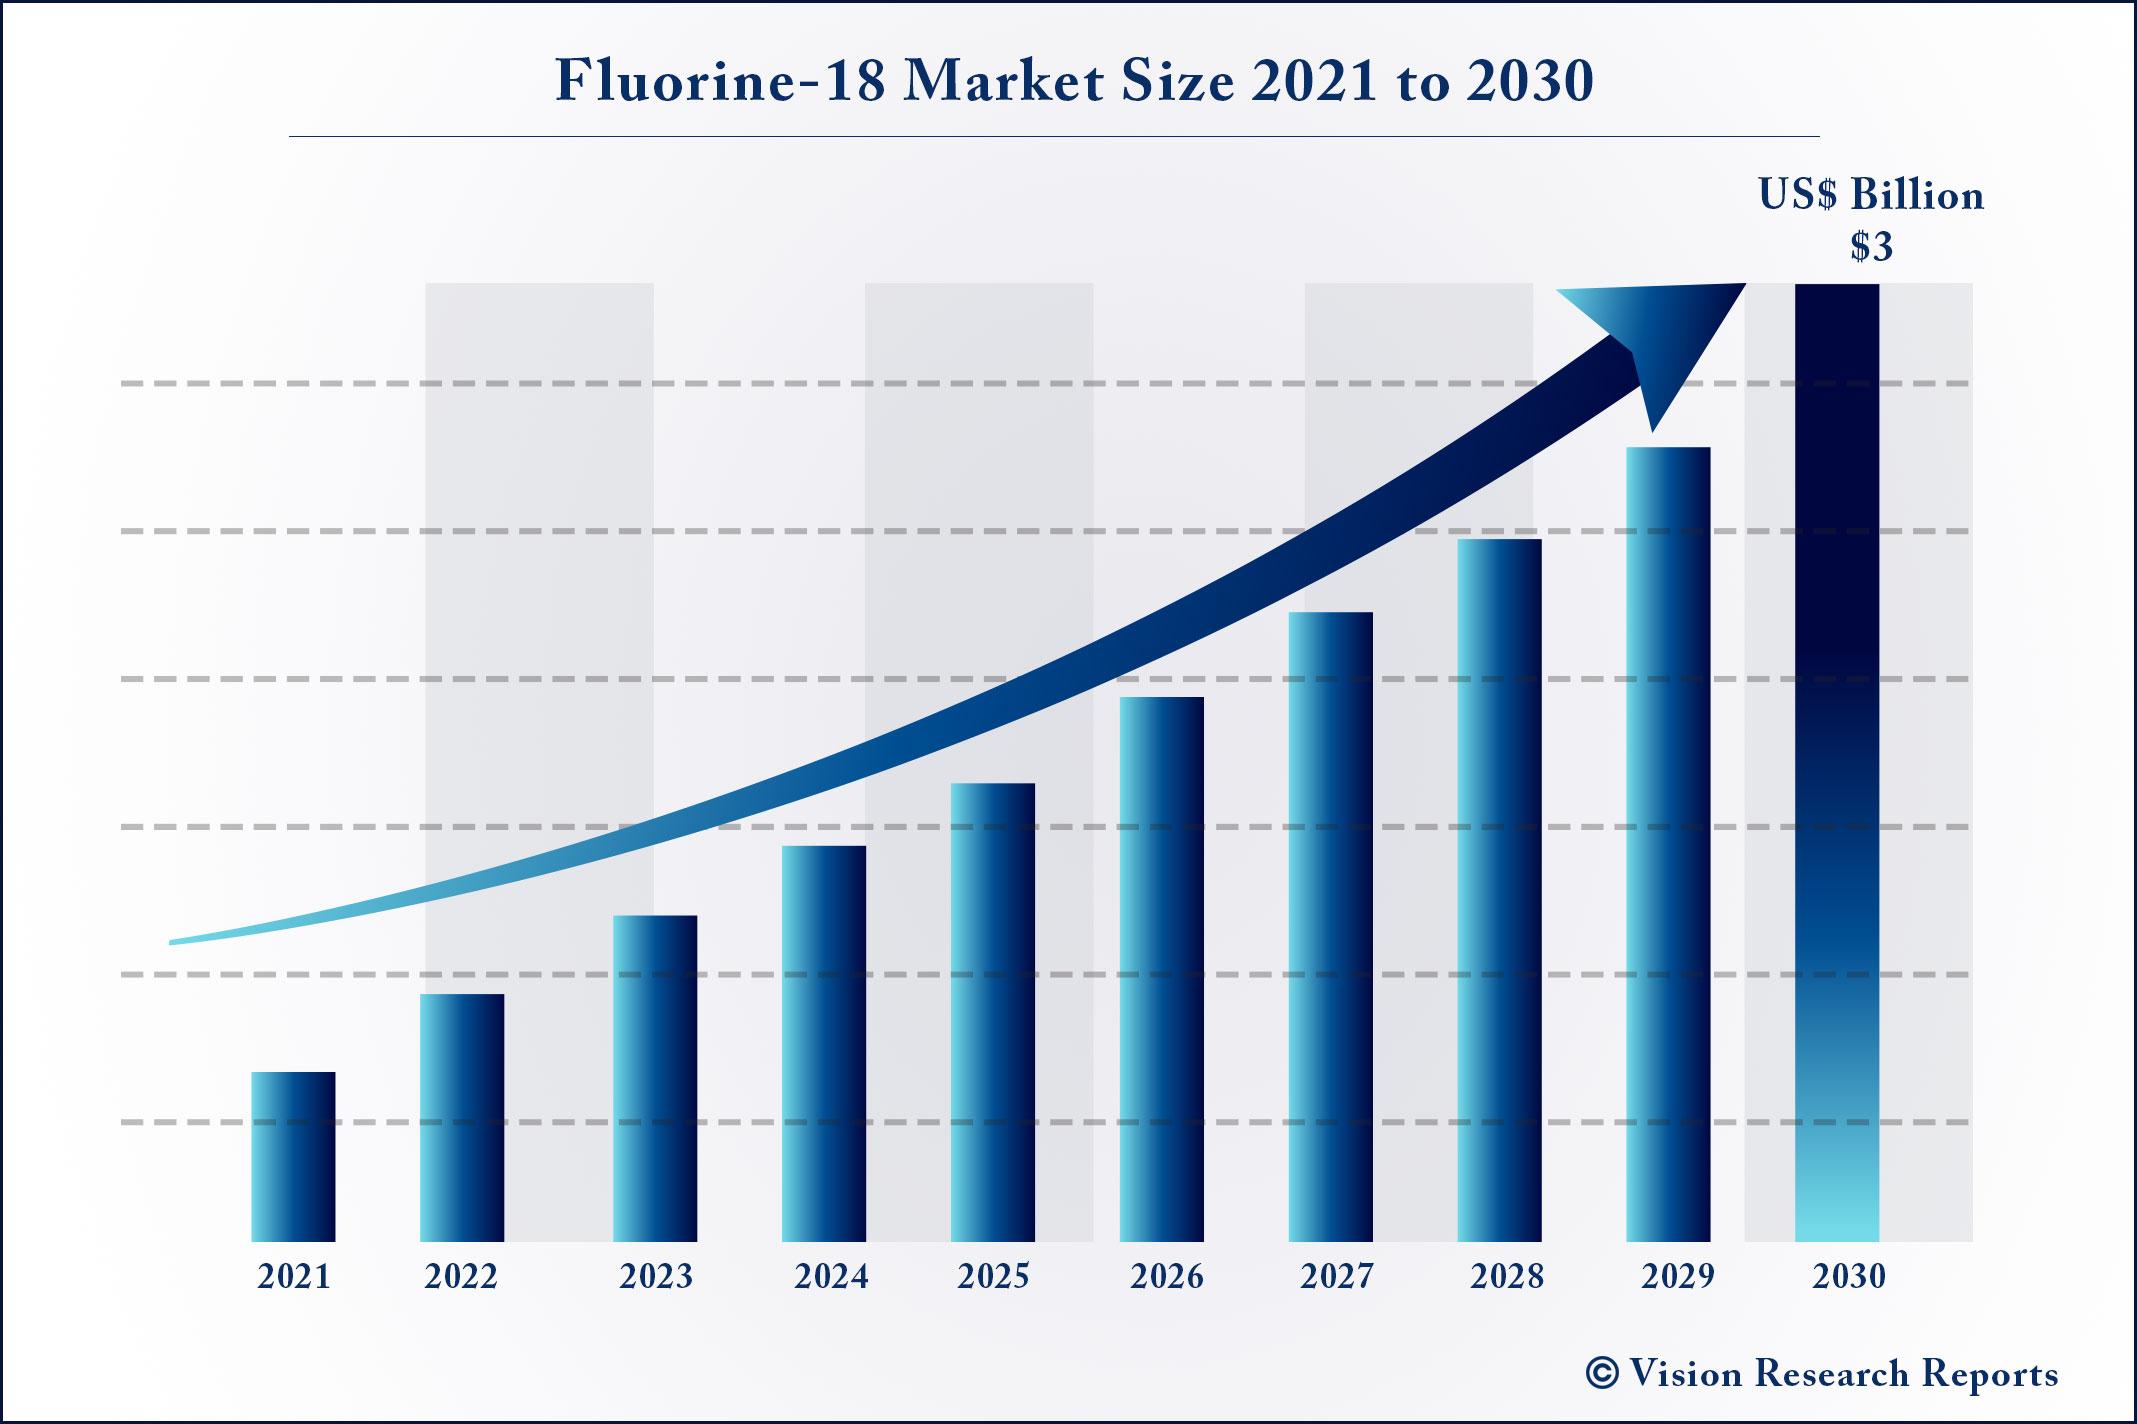 Fluorine-18 Market Size 2021 to 2030